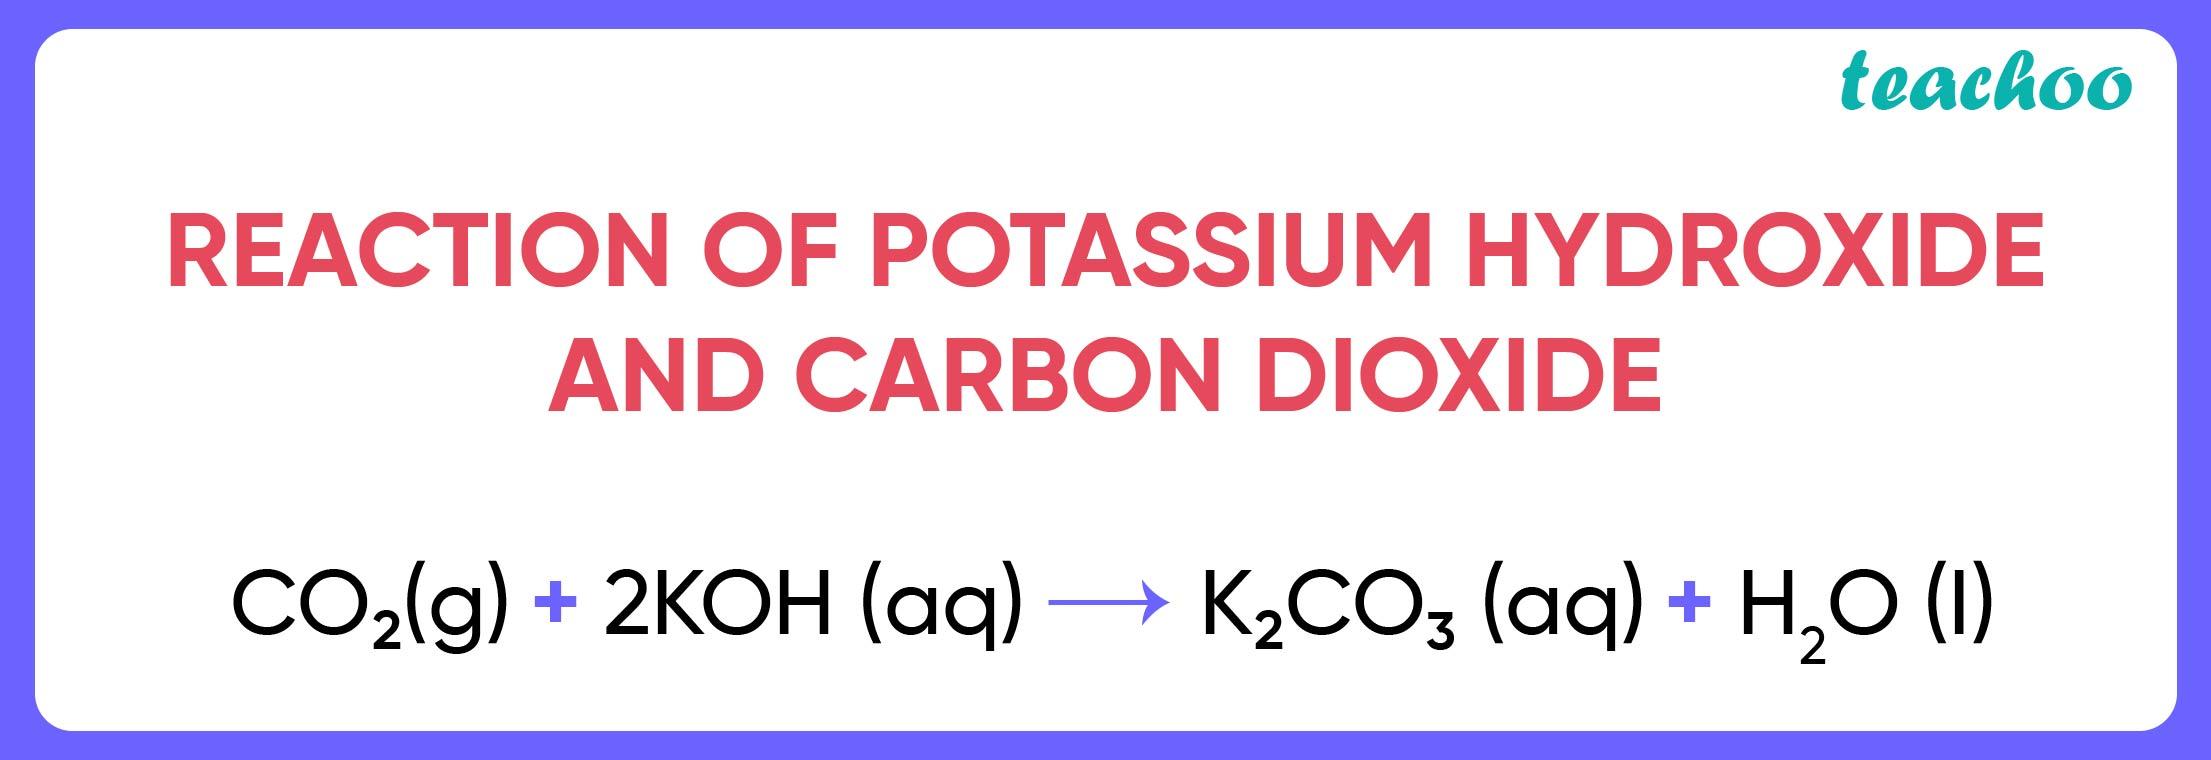 Reaction of Potassium Hydroxide and Carbon Dioxide-01.jpg